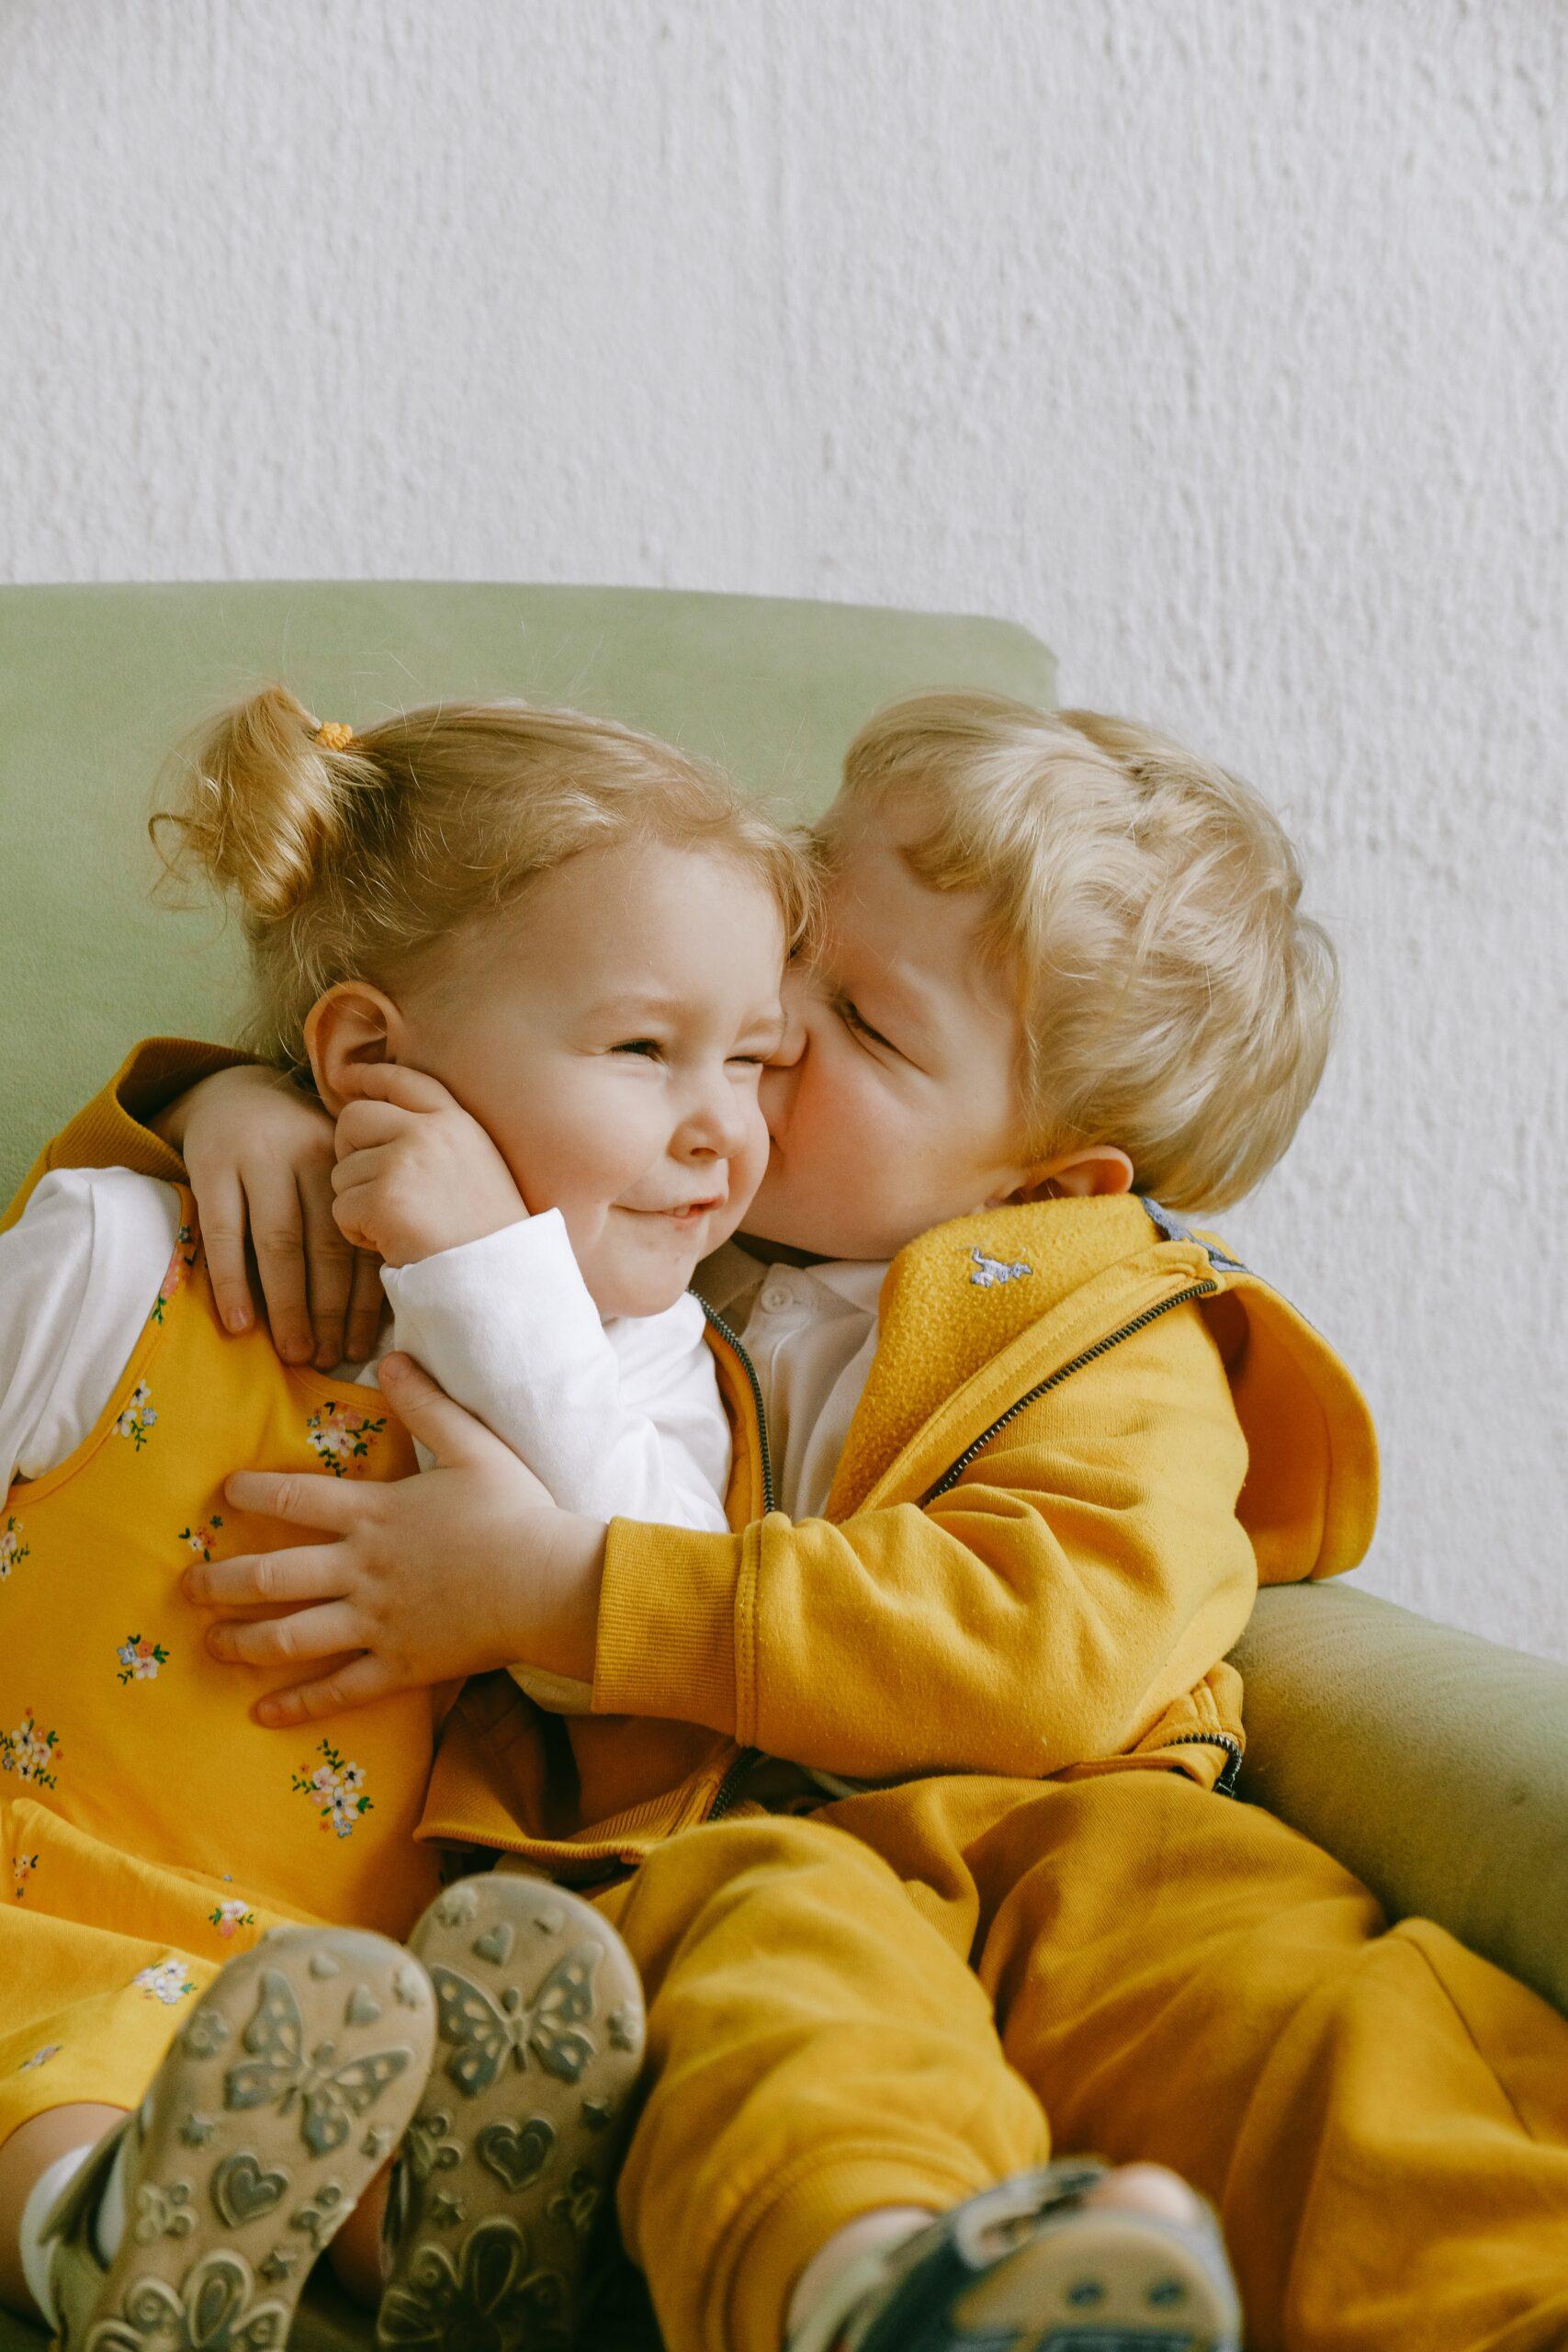 hermanos besándose 9 odcast Encuentro Matrimonial